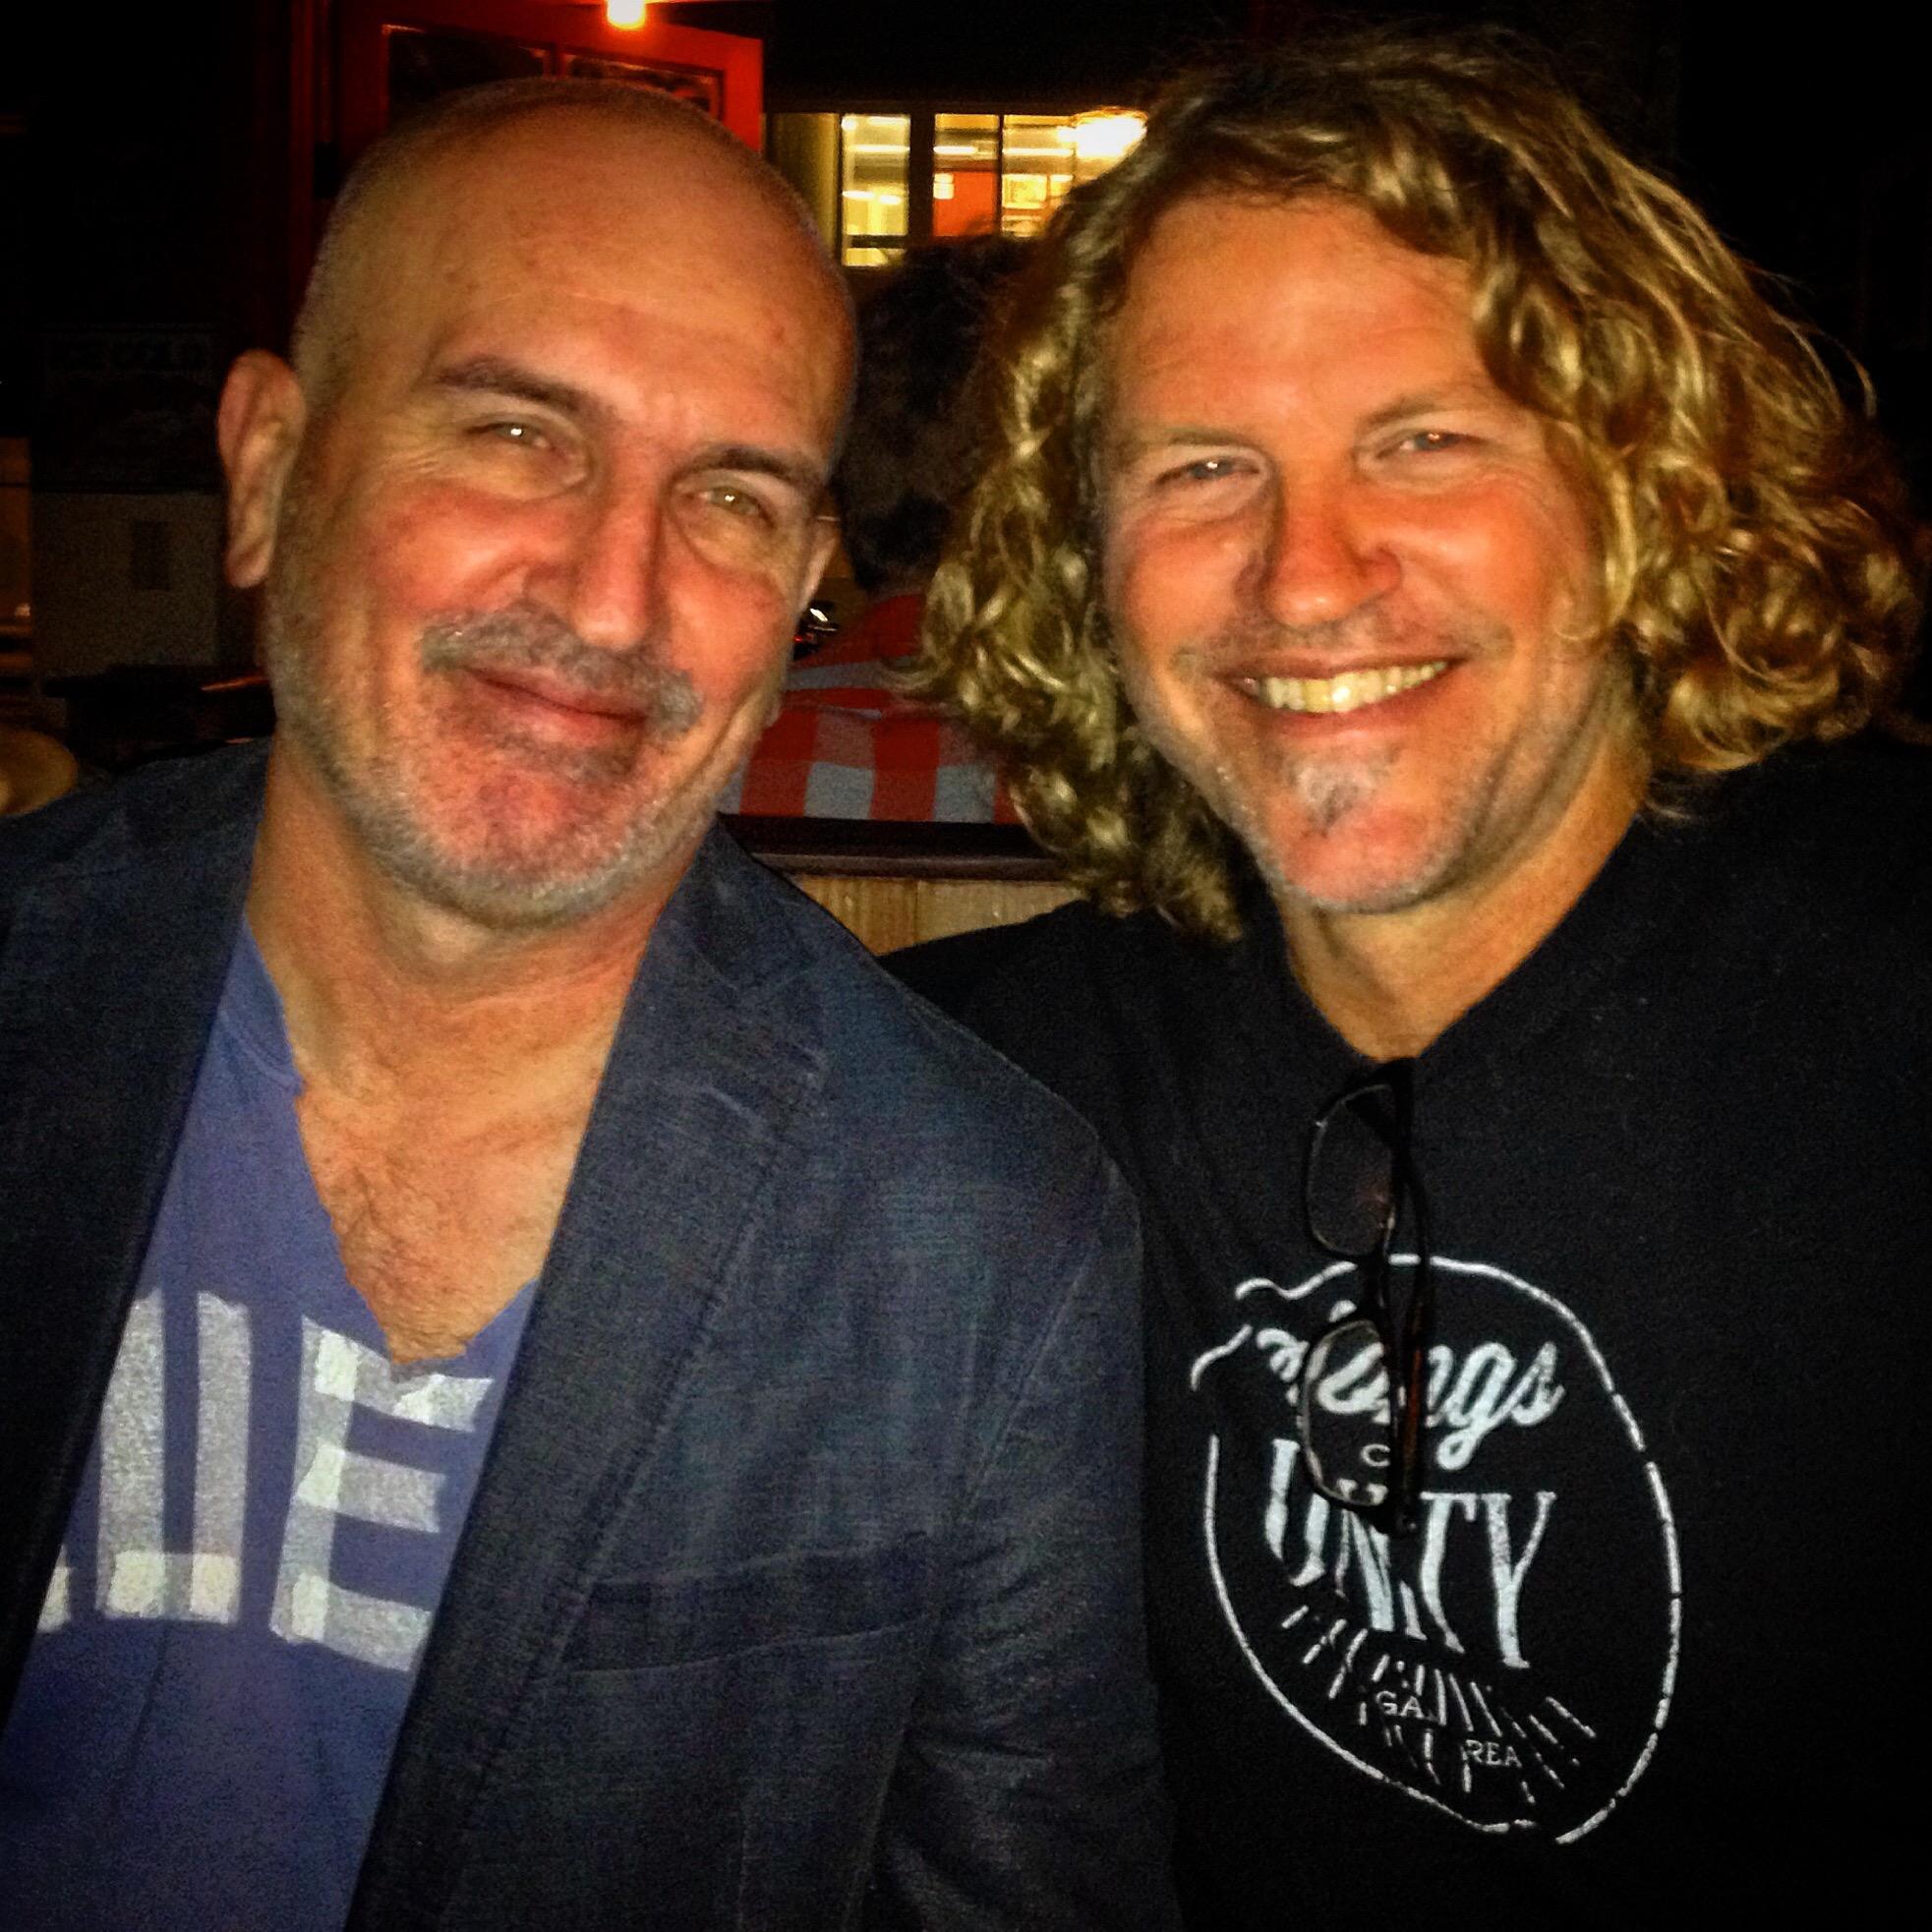 Singer/Songwriter/Producer Chris Falson & Performance Artist Tom Clark & I hanging in LA.